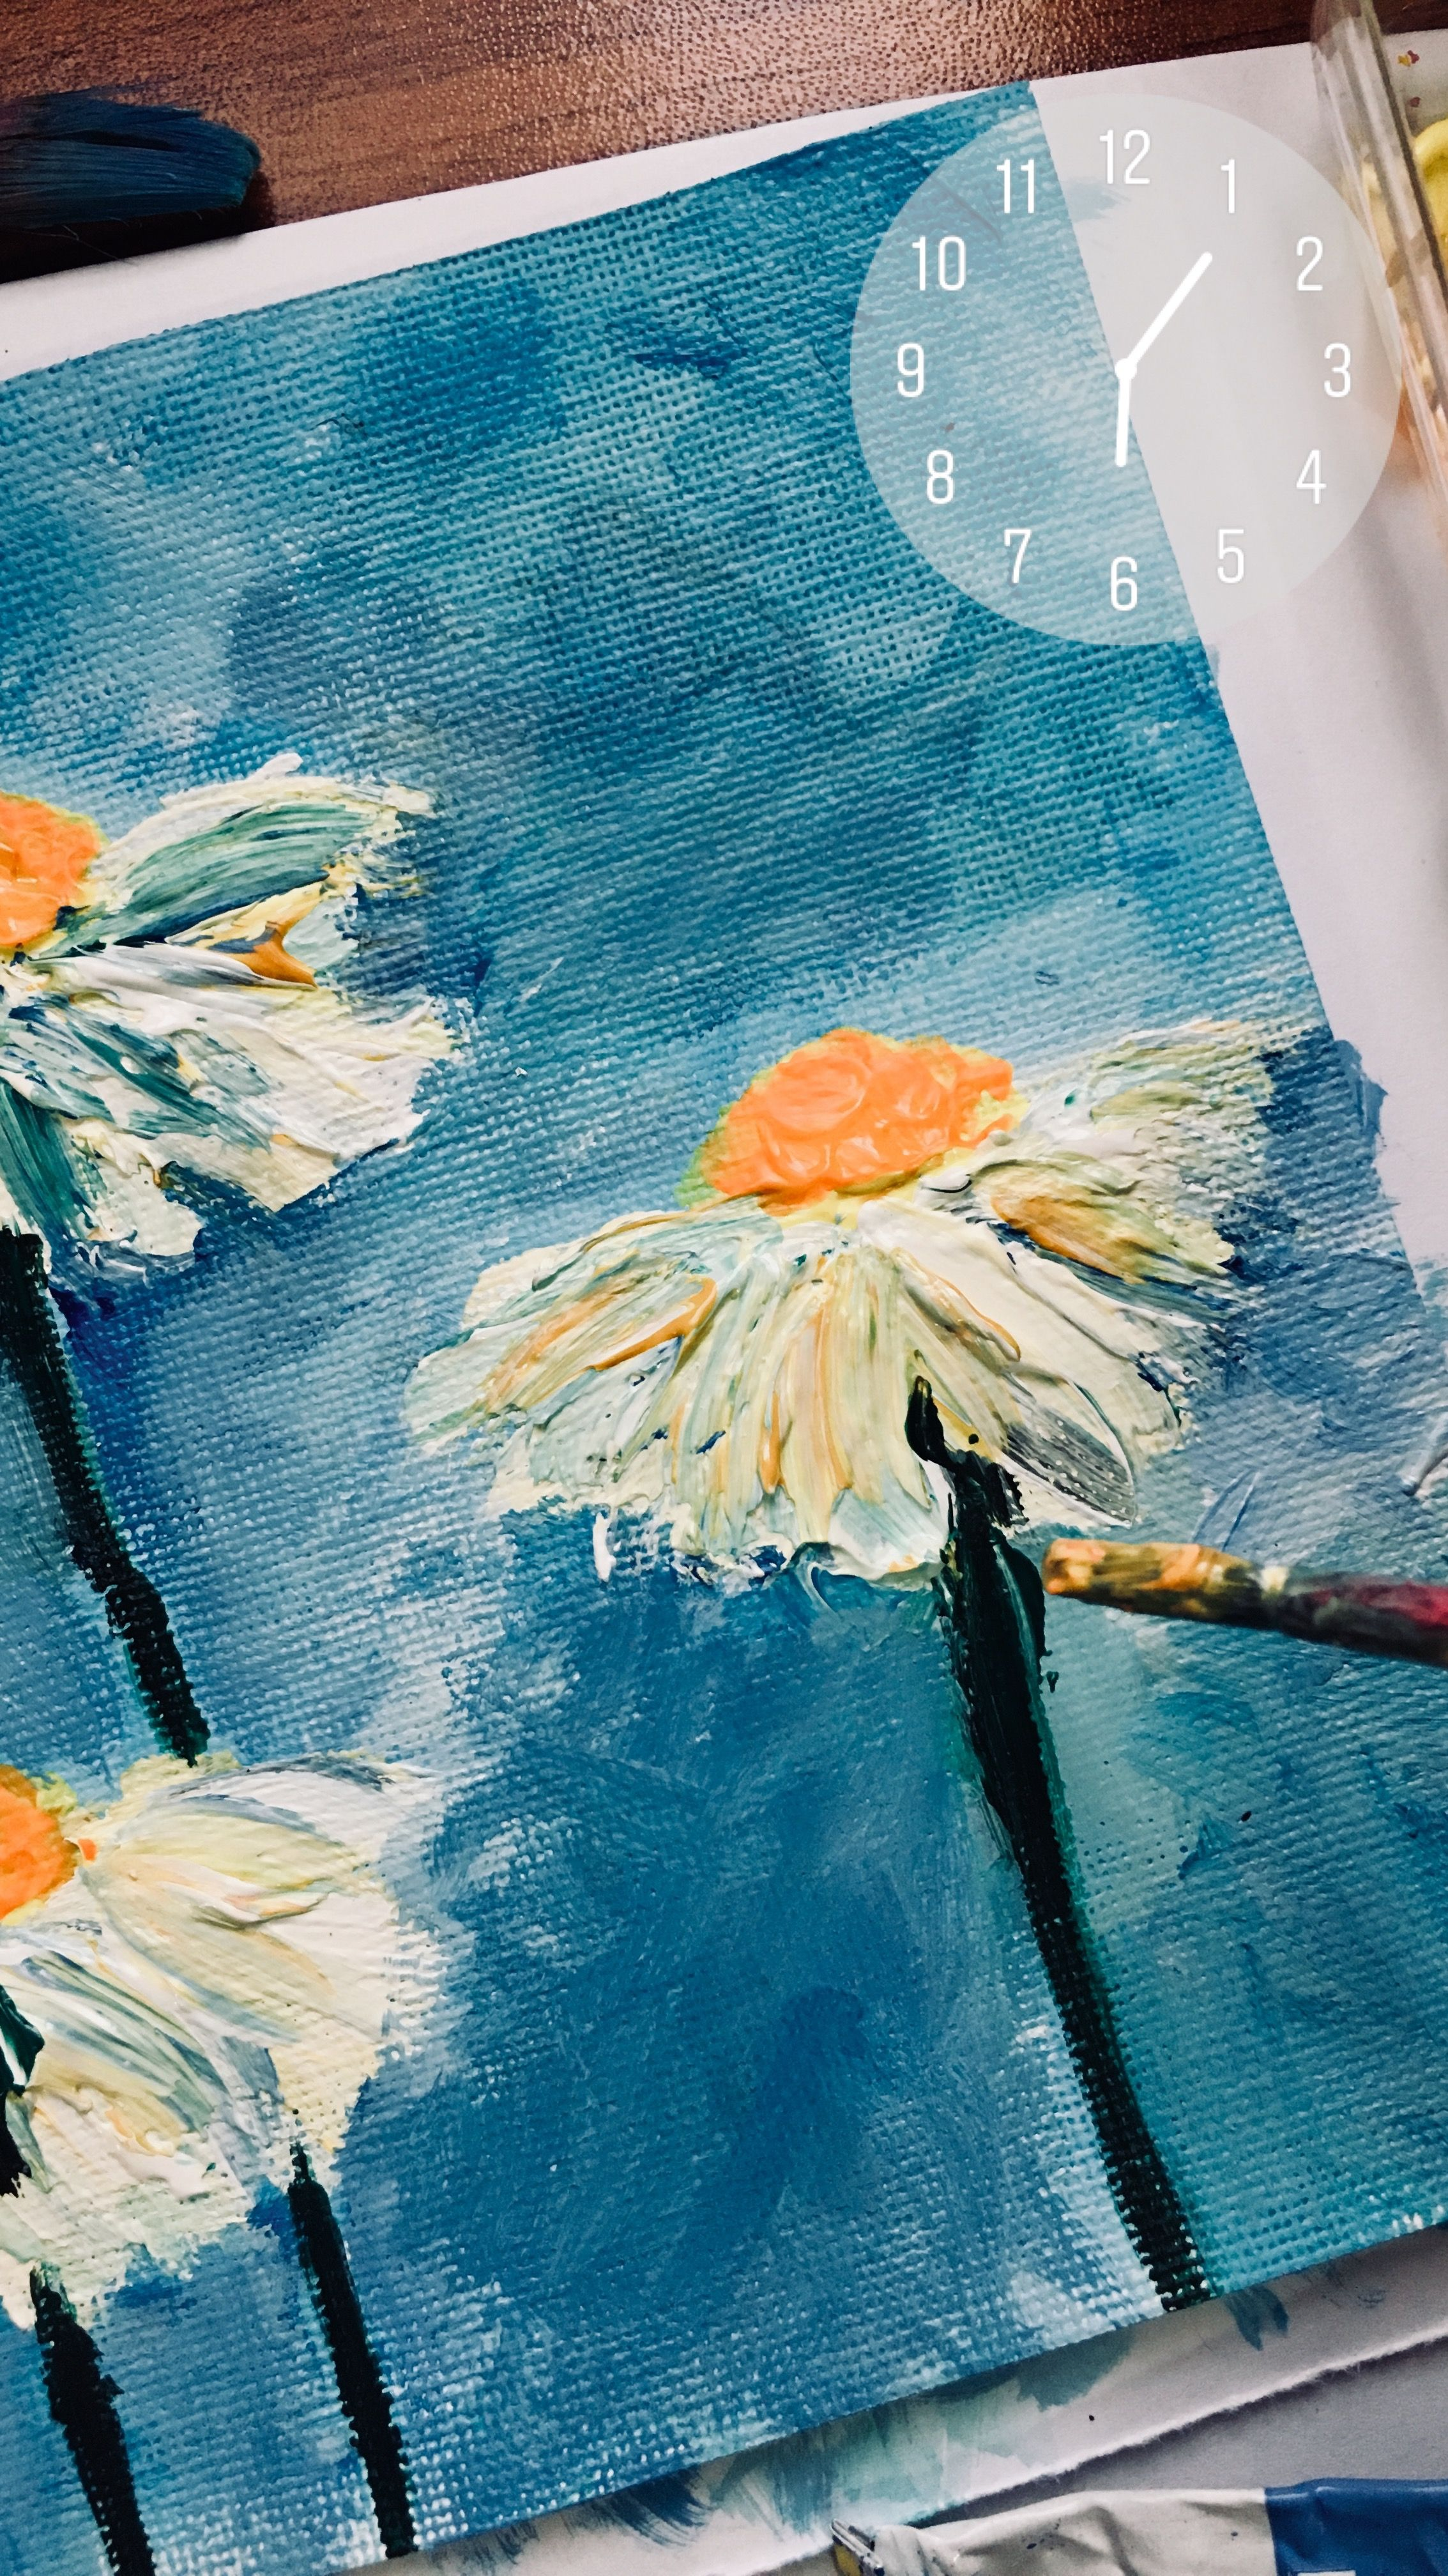 Acrylic Painting Aesthetic : acrylic, painting, aesthetic, Acrylics, Canvas, Paper, Painting,, Aesthetic, Painting